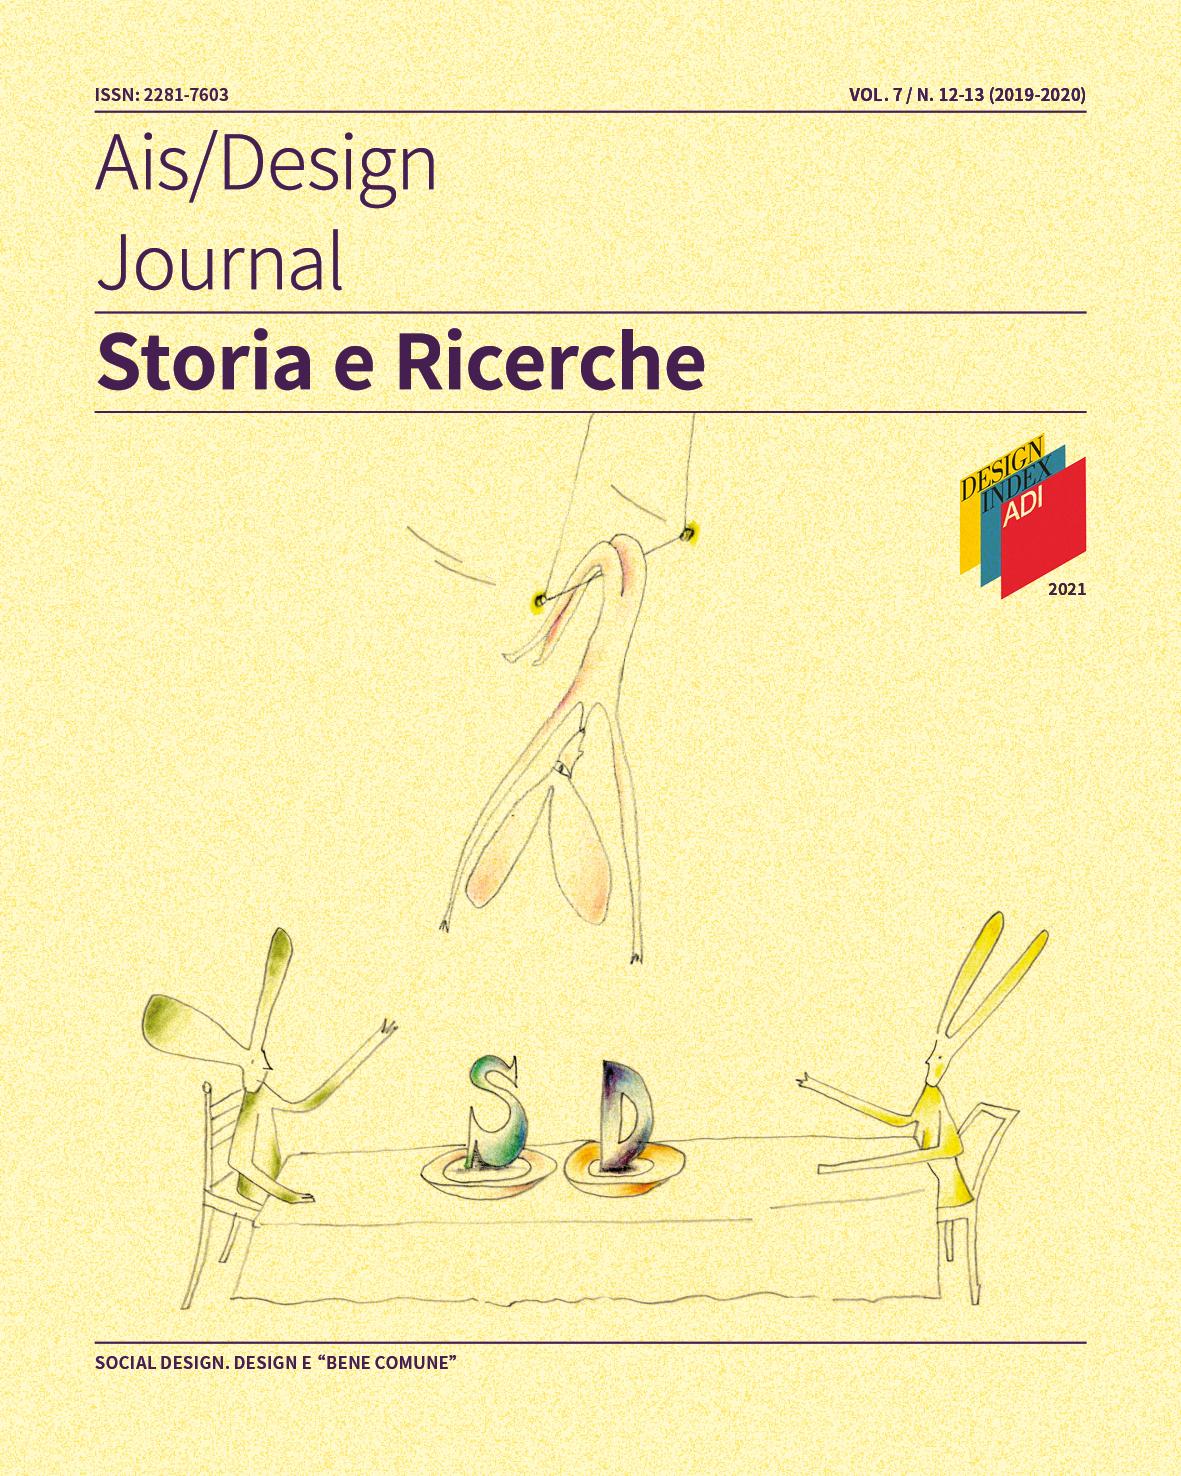 #12-13 AIS/DESIGN JOURNAL / SOCIAL DESIGN